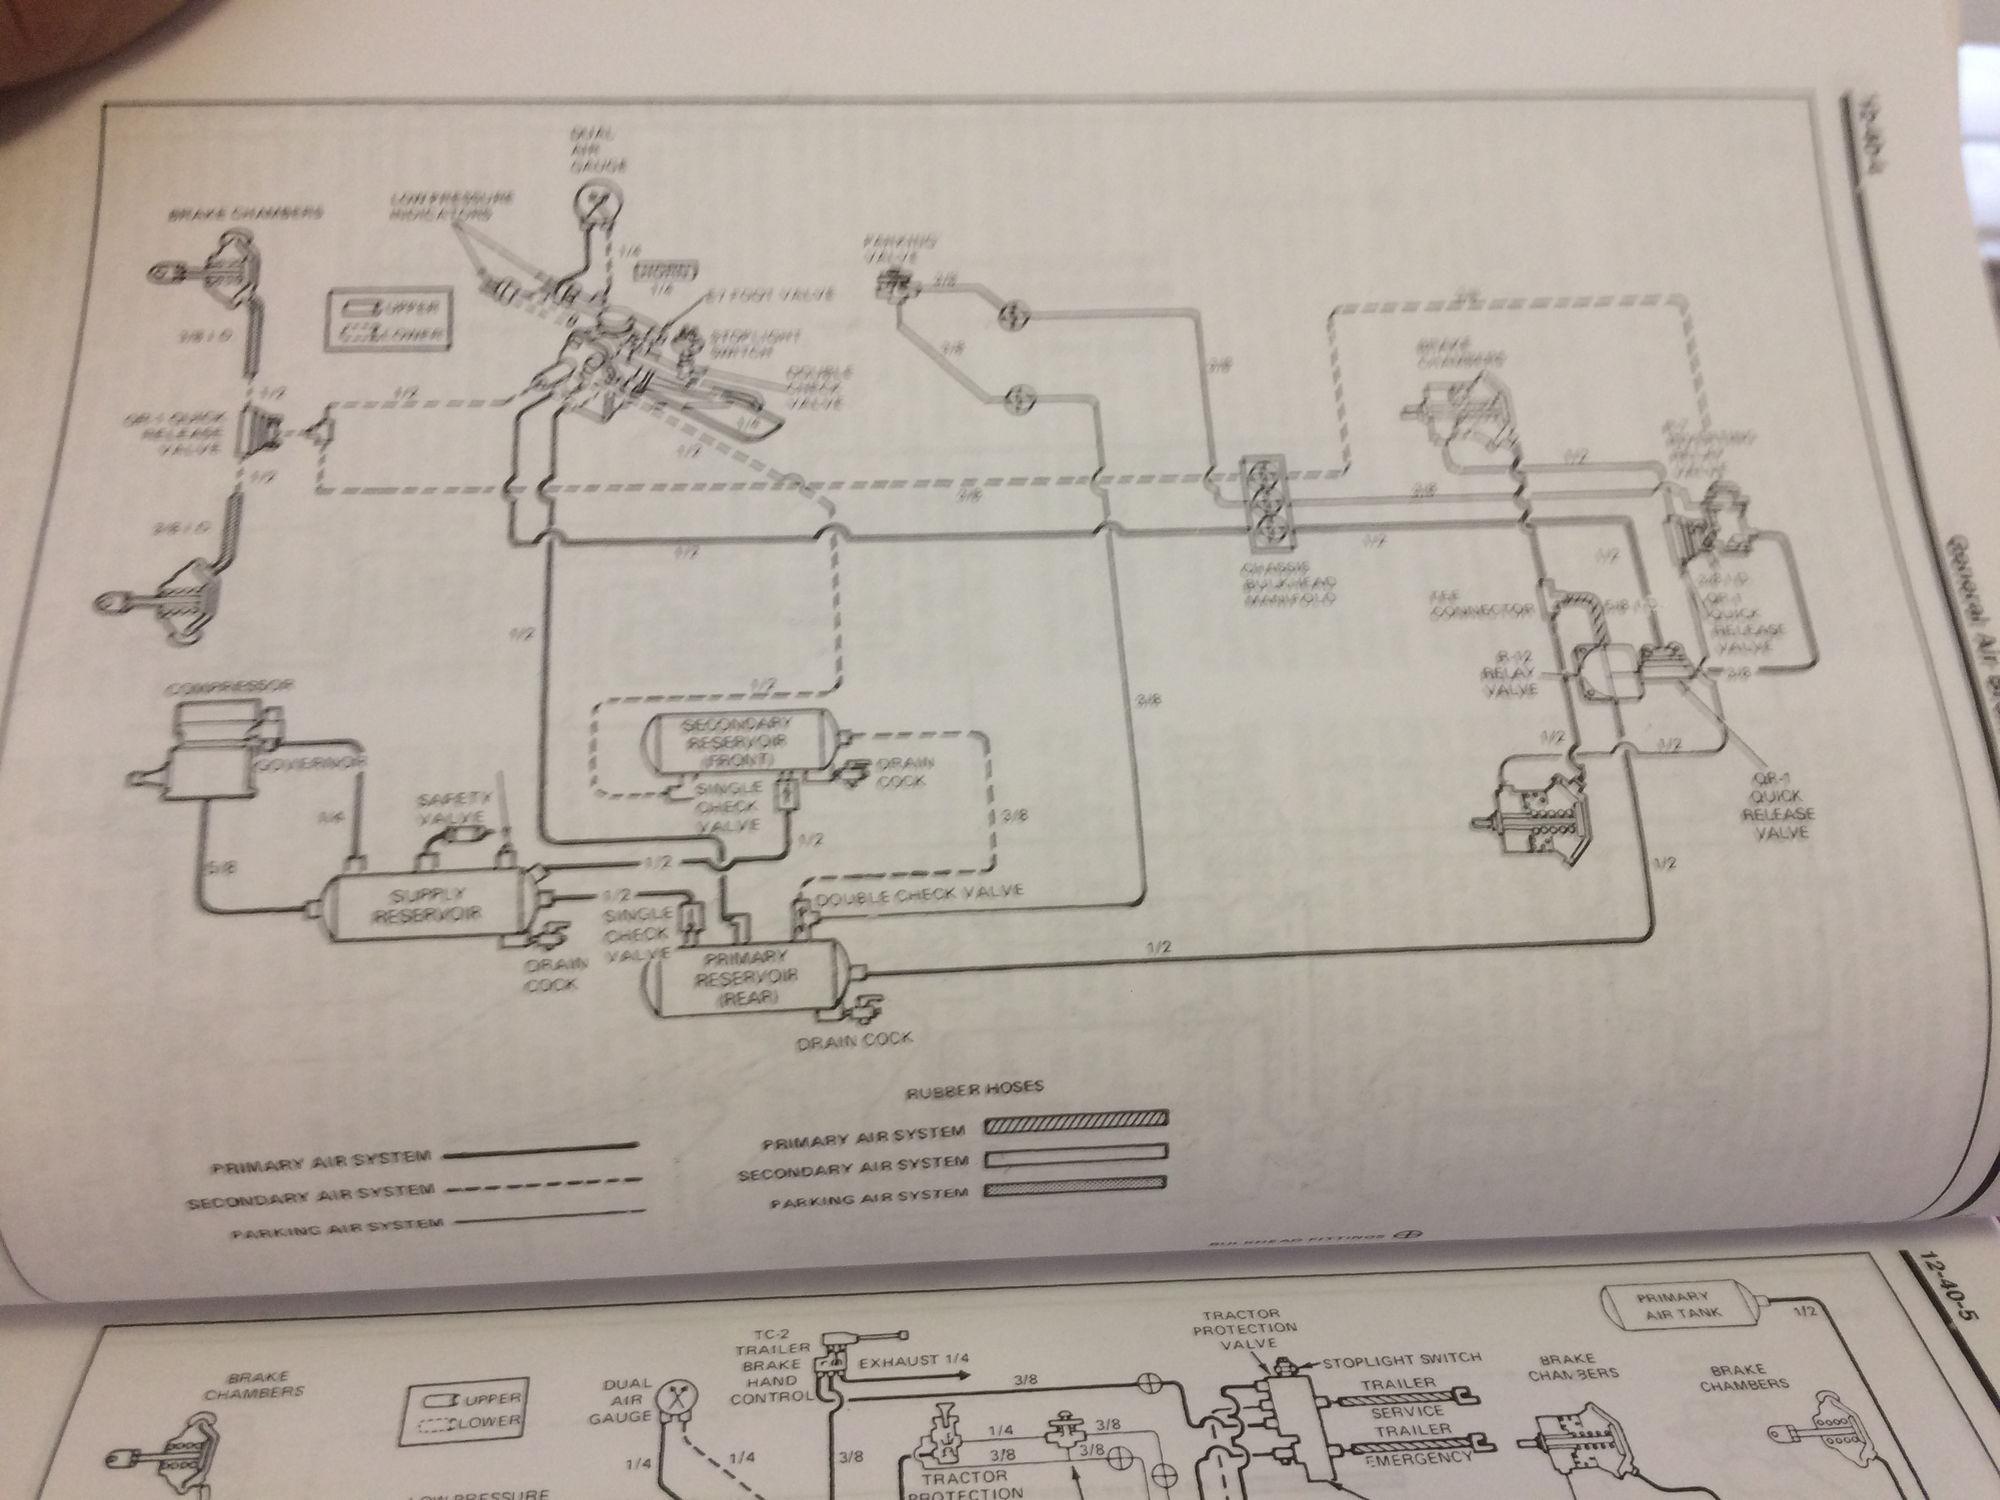 electrical wiring diagram ford f650 ranger boat trailer for honda